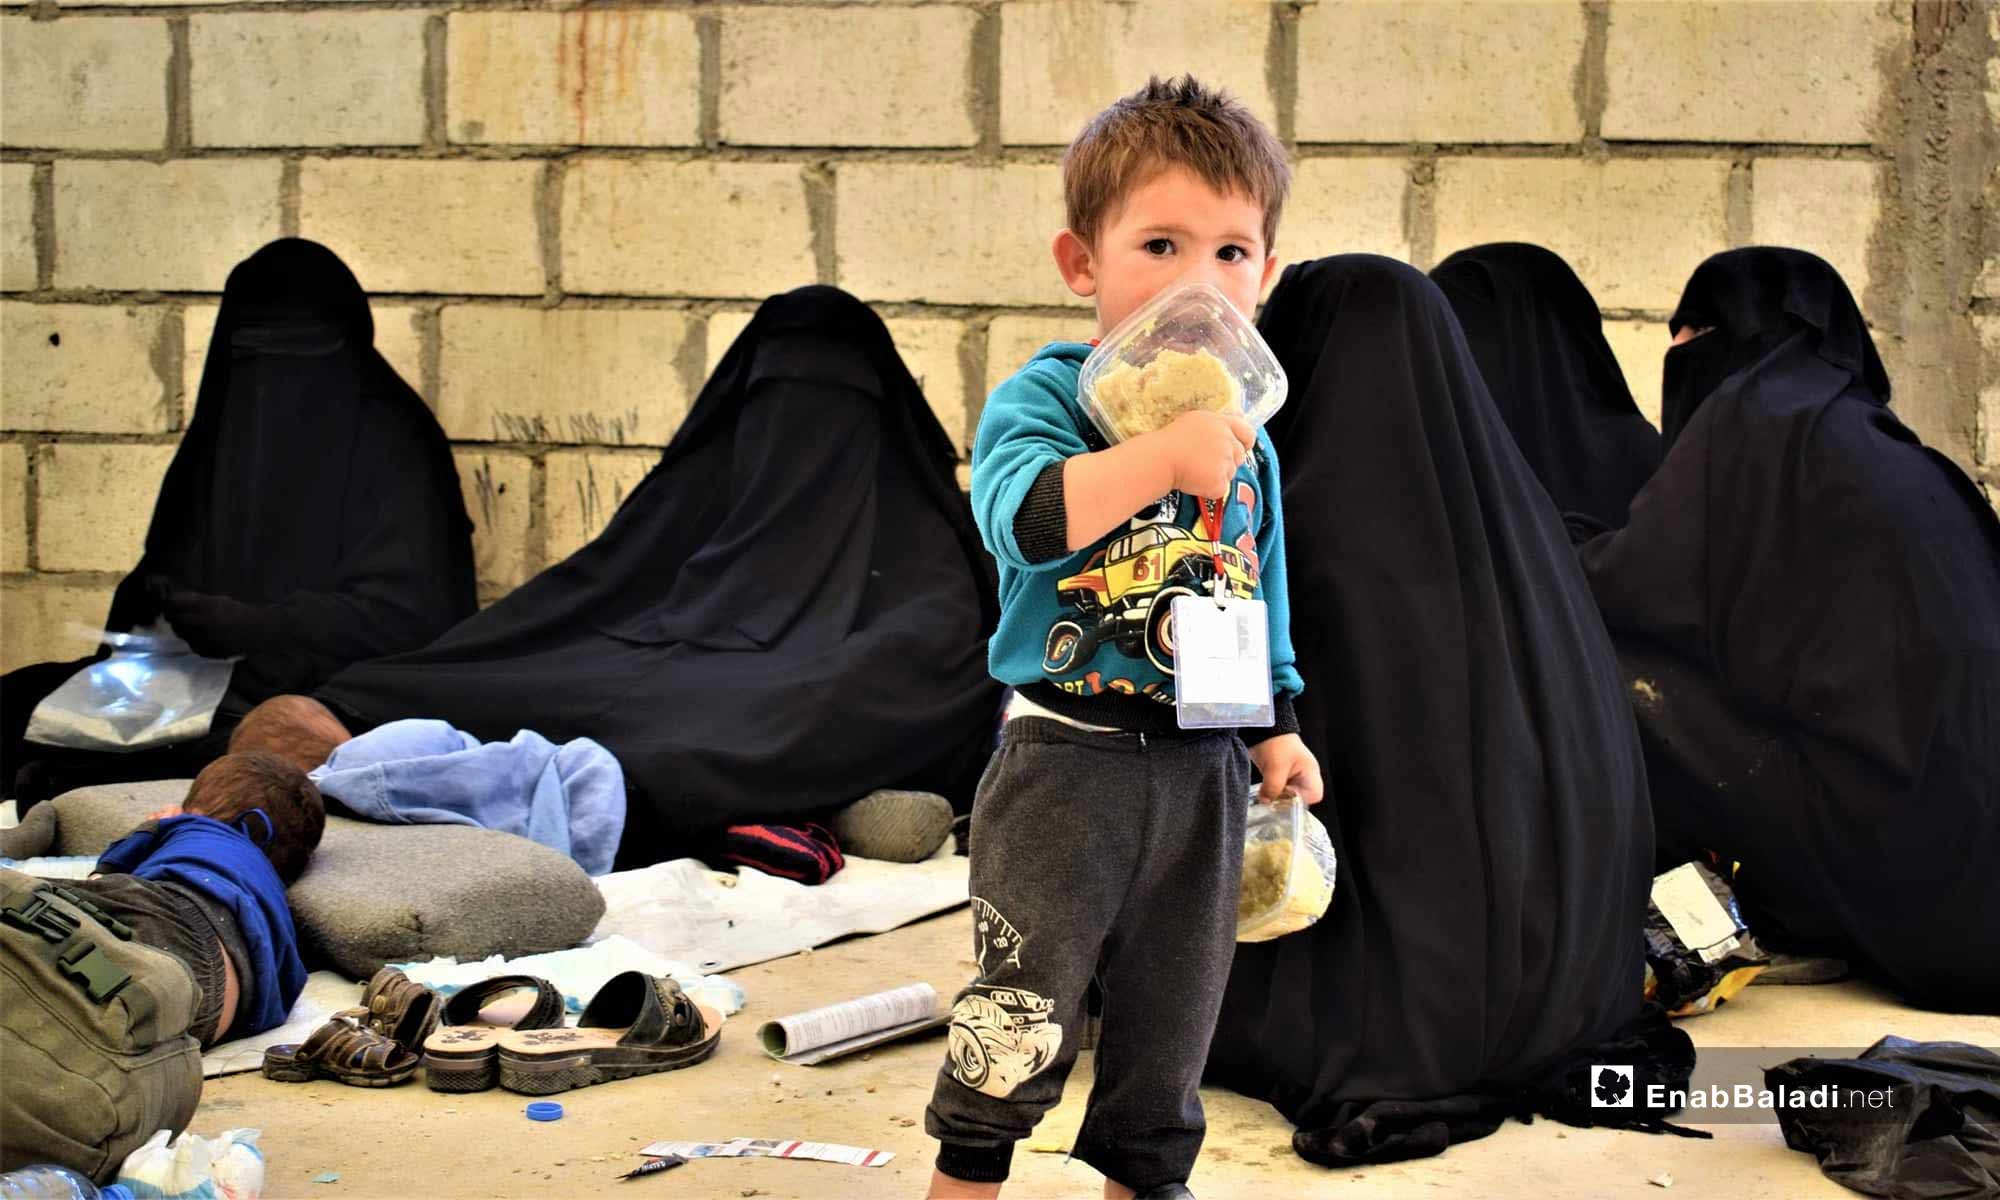 Families at the al-Hawl IDP Camp, east of the Euphrates – July 18, 2019 (Enab Baladi)